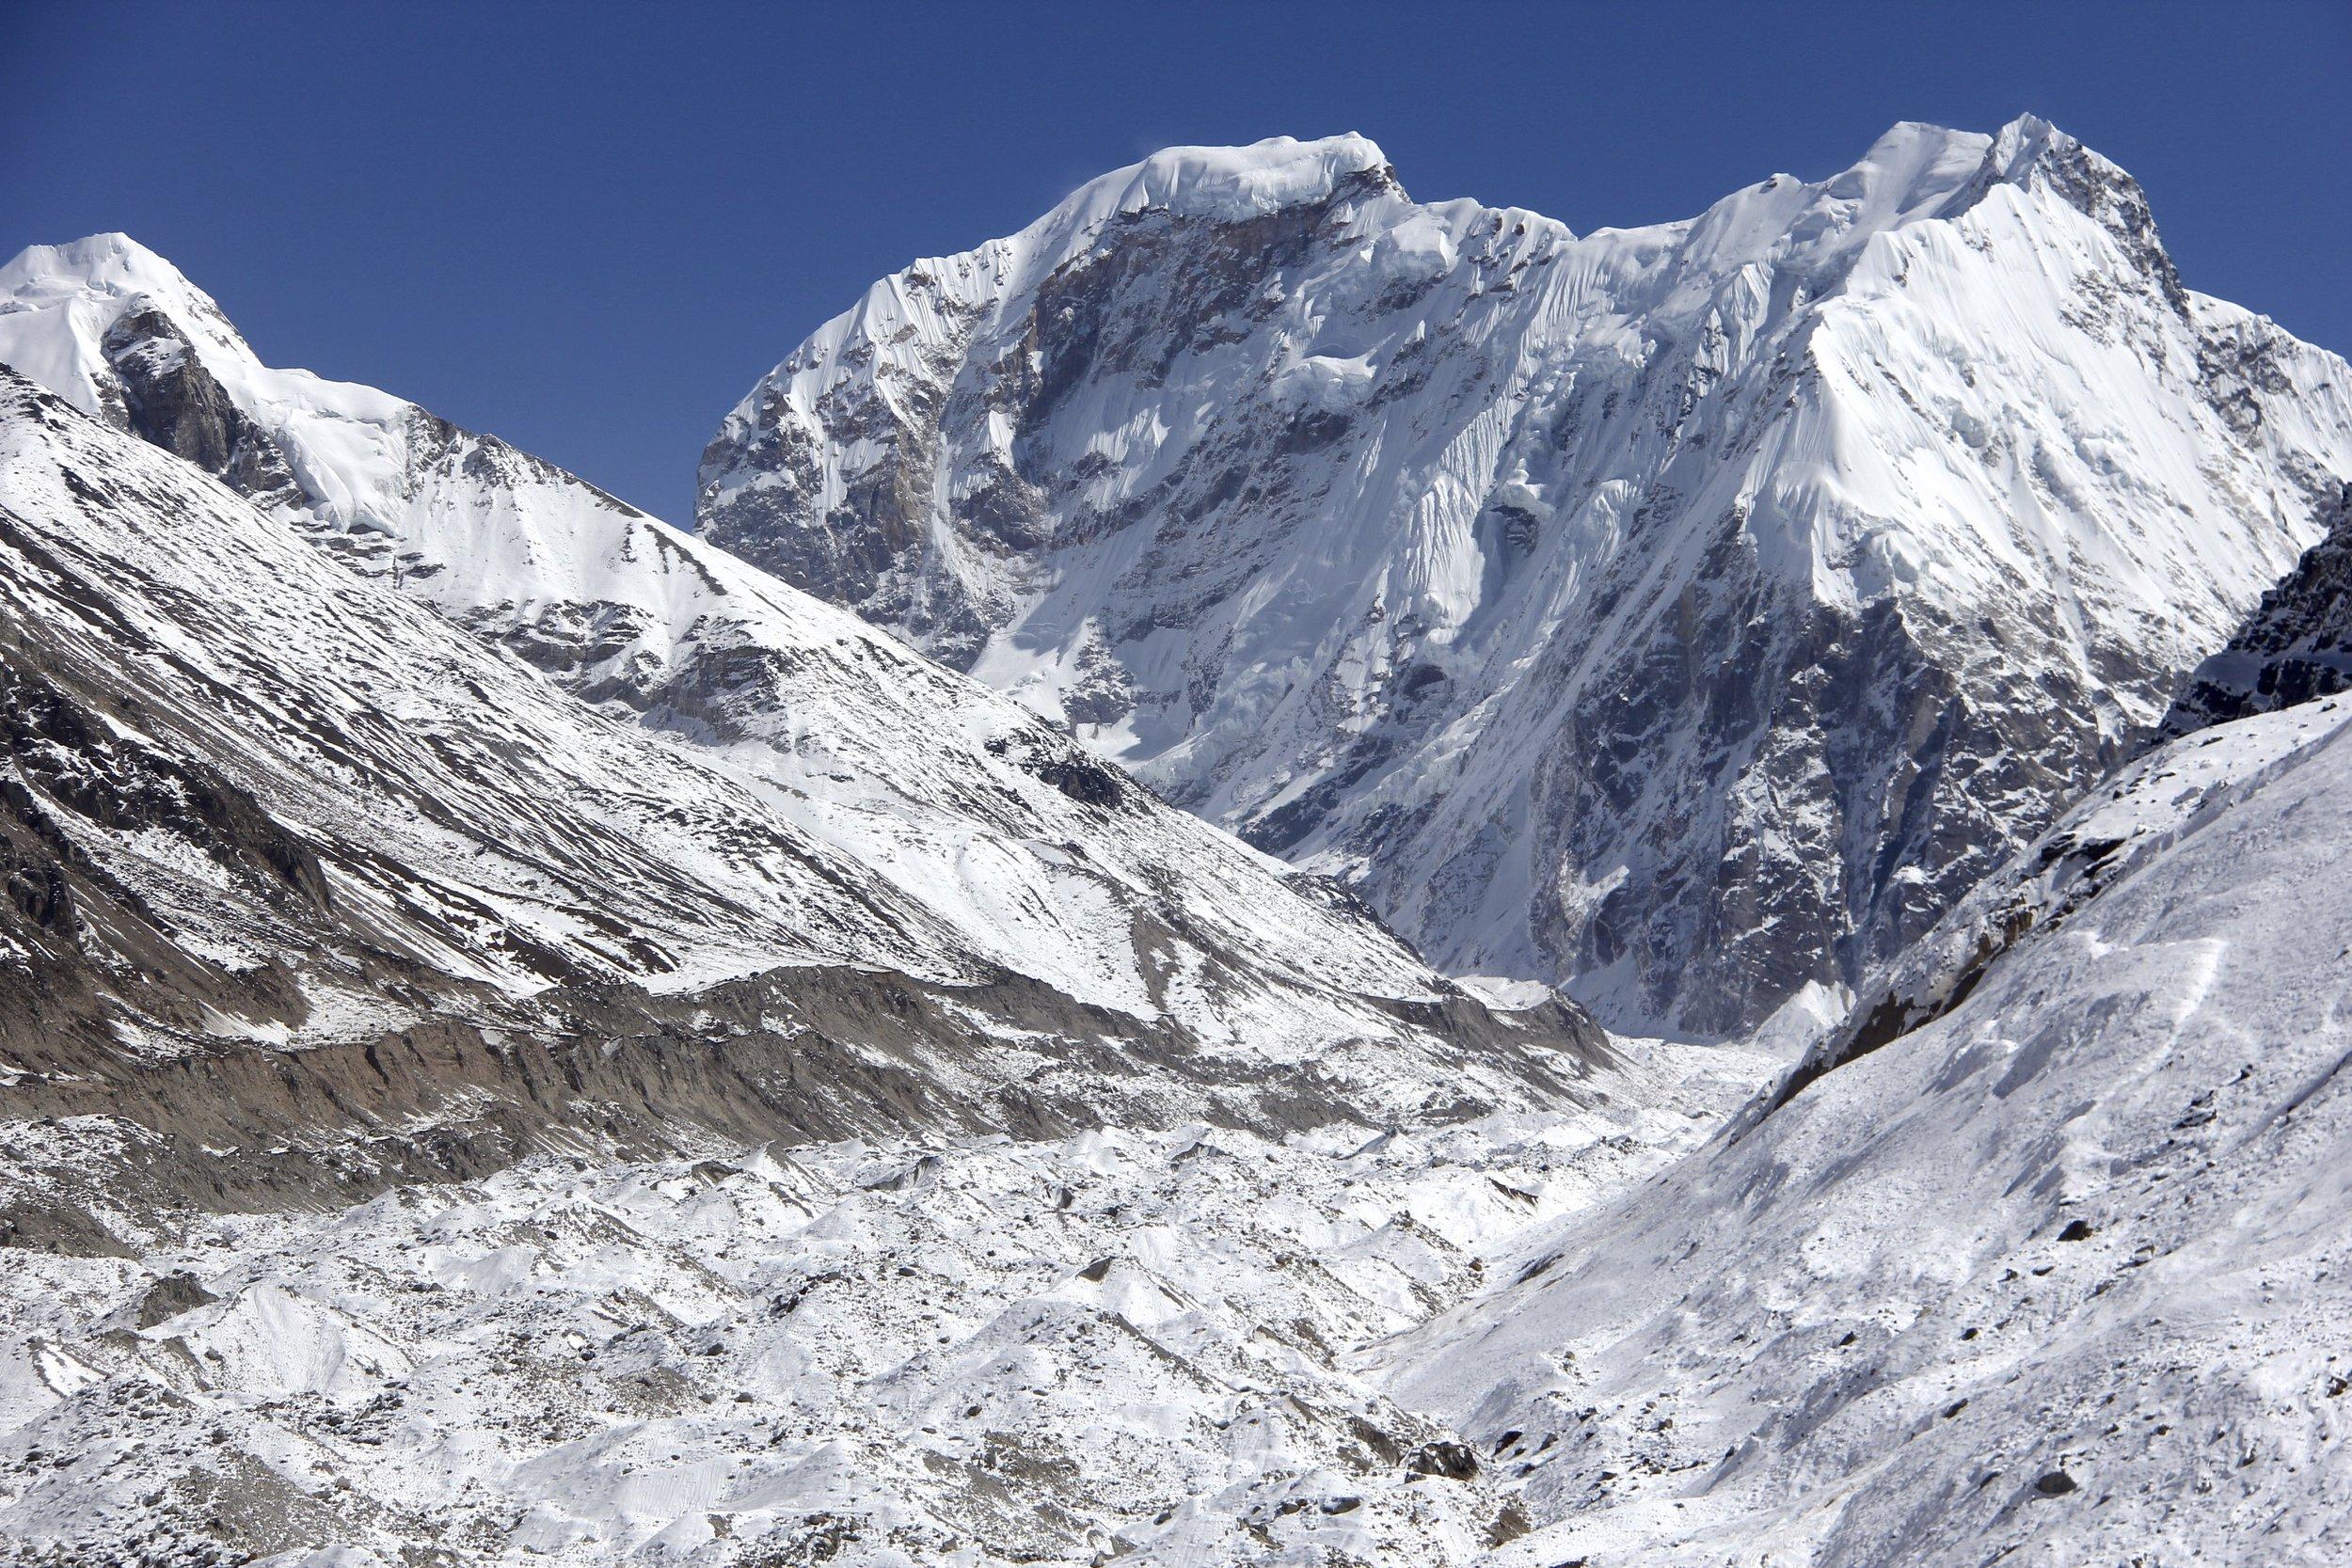 Tent Peak 7,362m and Nepal Peak 7,177m above the Kanchendzonga Glacier.